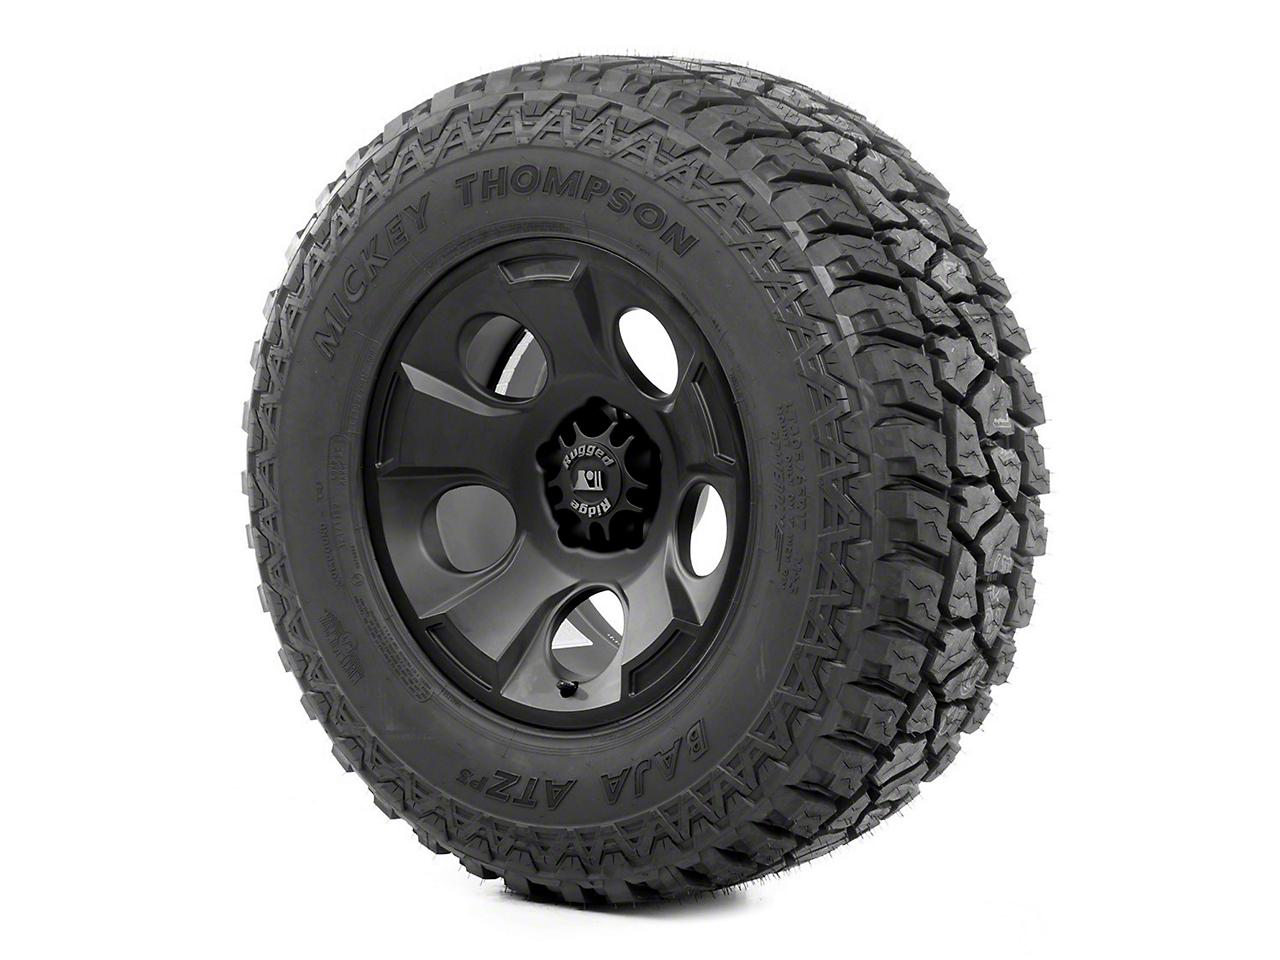 Rugged Ridge Drakon Wheel 17x9 Black Satin and Mickey Thompson ATZ P3 315/70R17 Tire (07-12 Jeep Wrangler JK)